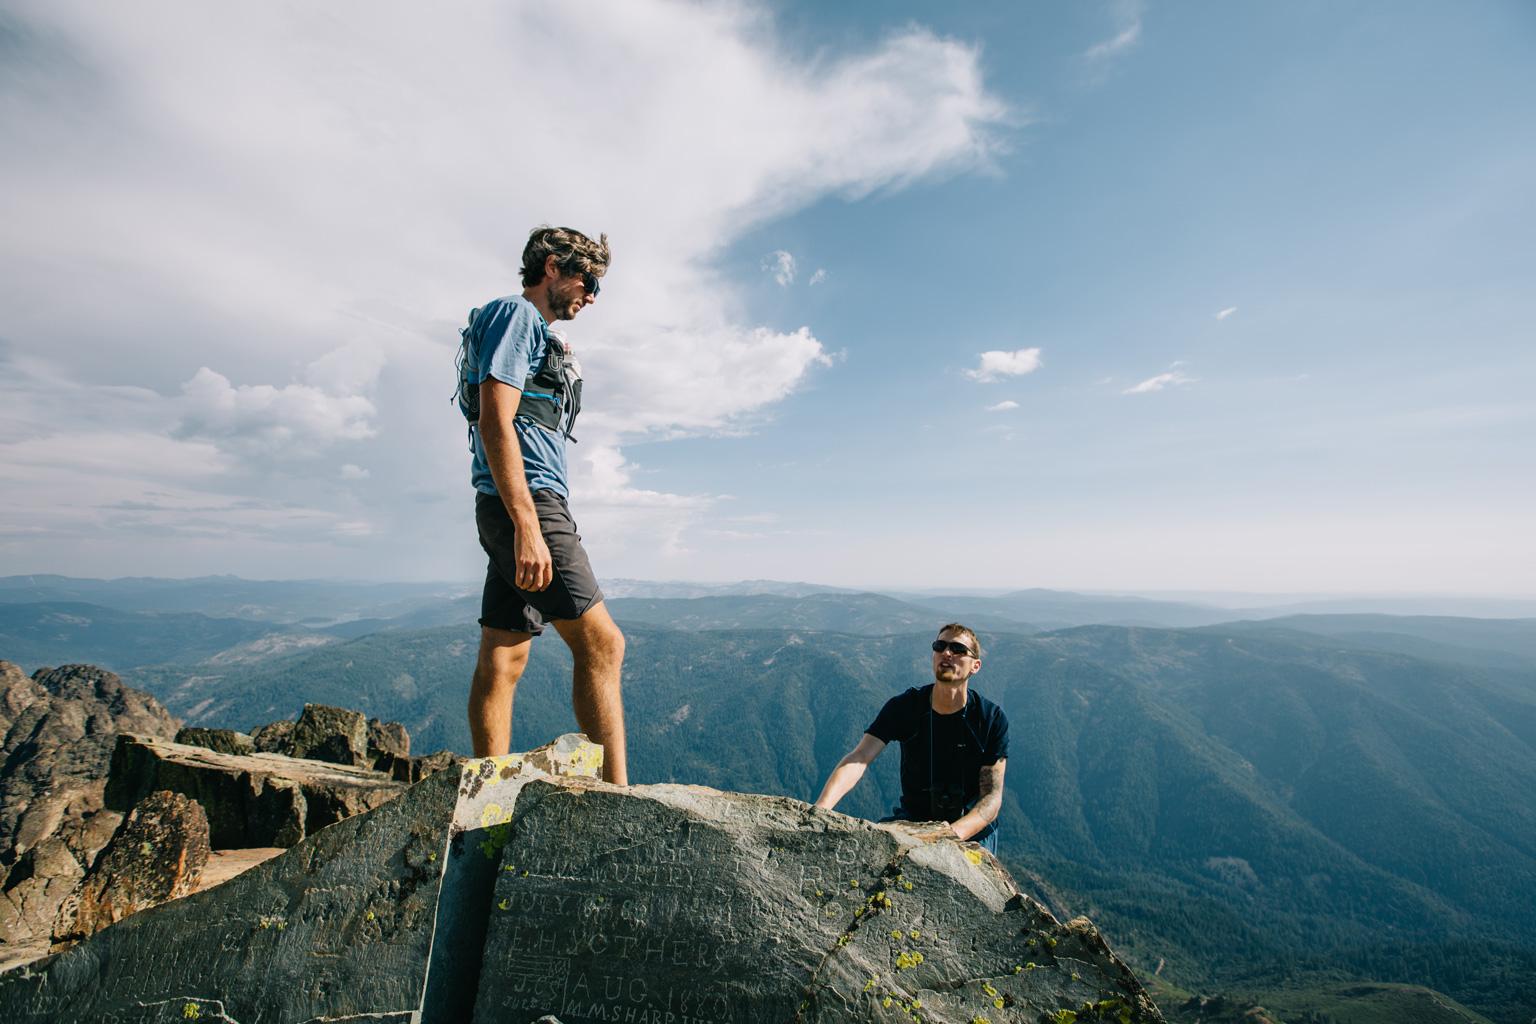 CindyGiovagnoli_outdoors_photographer_Sierra_Buttes_firetower_watchtower_Sardine_Snag_Bear_lake_hike_swim_camp-030.jpg